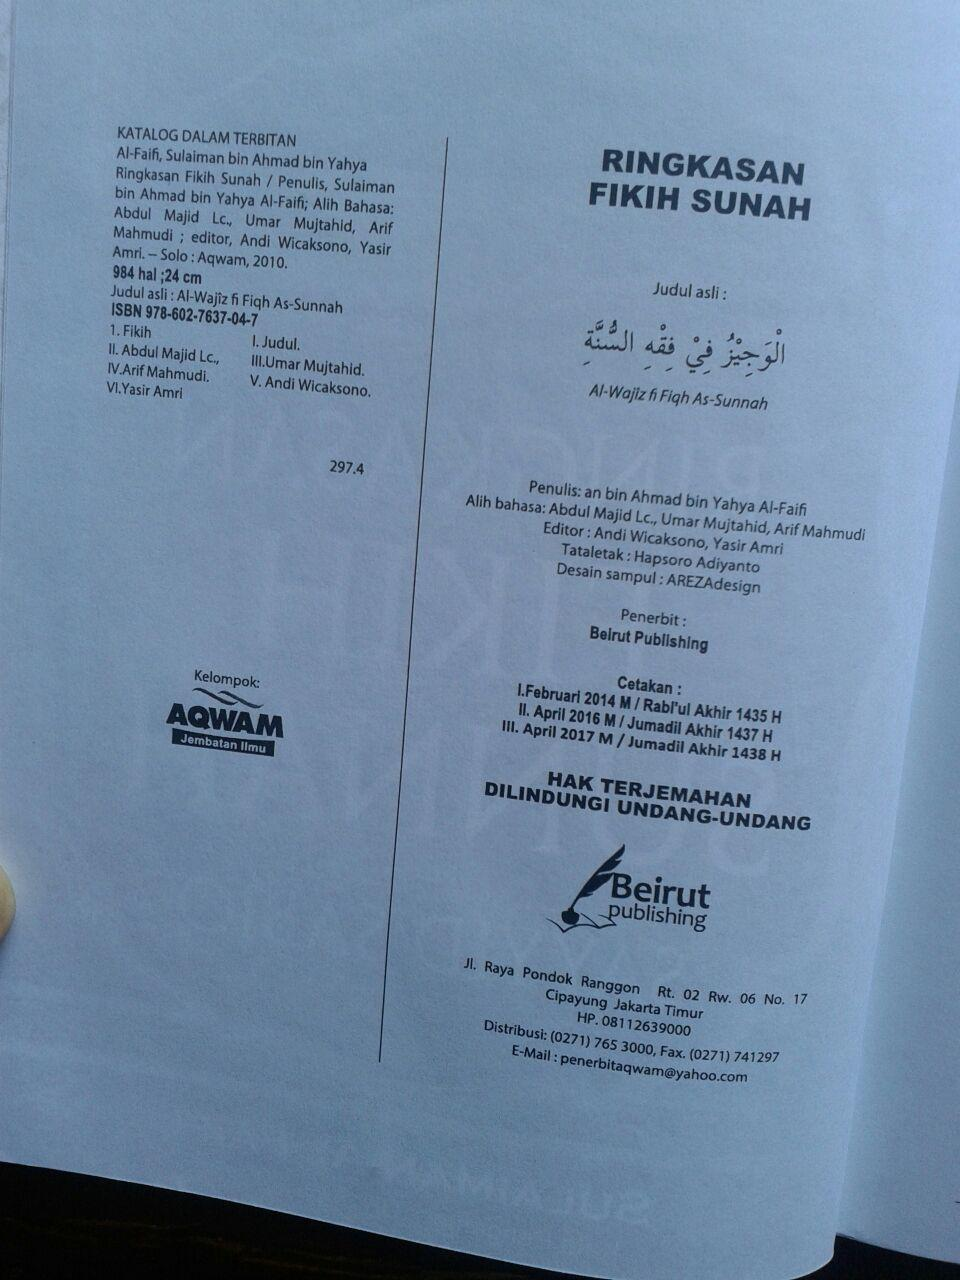 Buku Ringkasan Fikih Sunnah Sayyid Sabiq isi 5